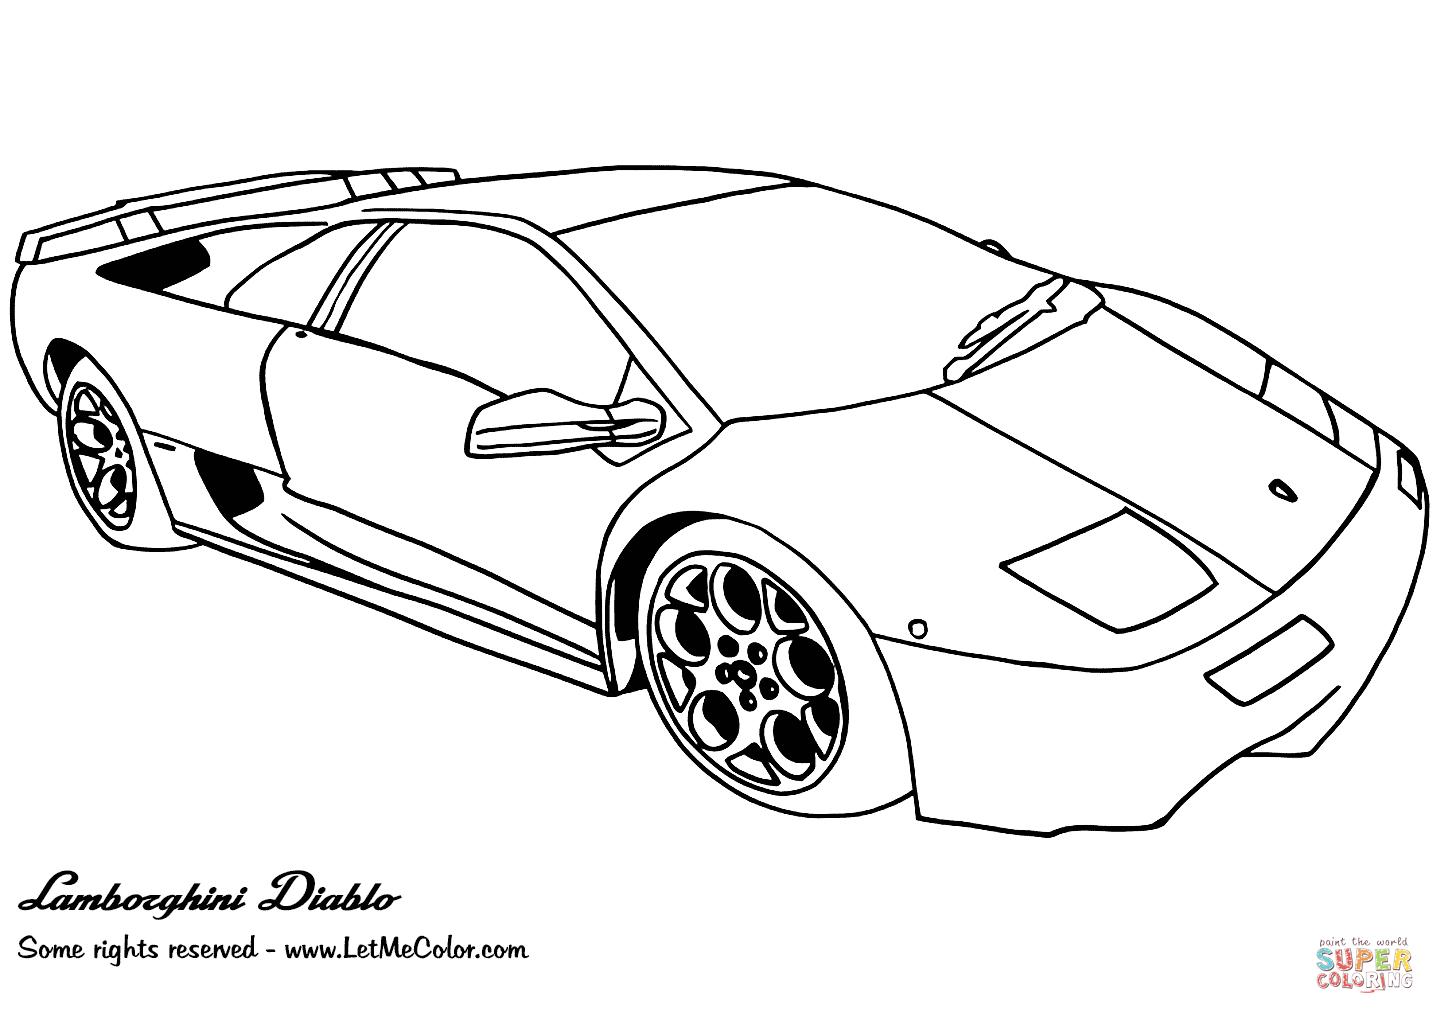 Ausmalbild: Lamborghini Diablo | Ausmalbilder Kostenlos Zum verwandt mit Malvorlagen Lamborghini